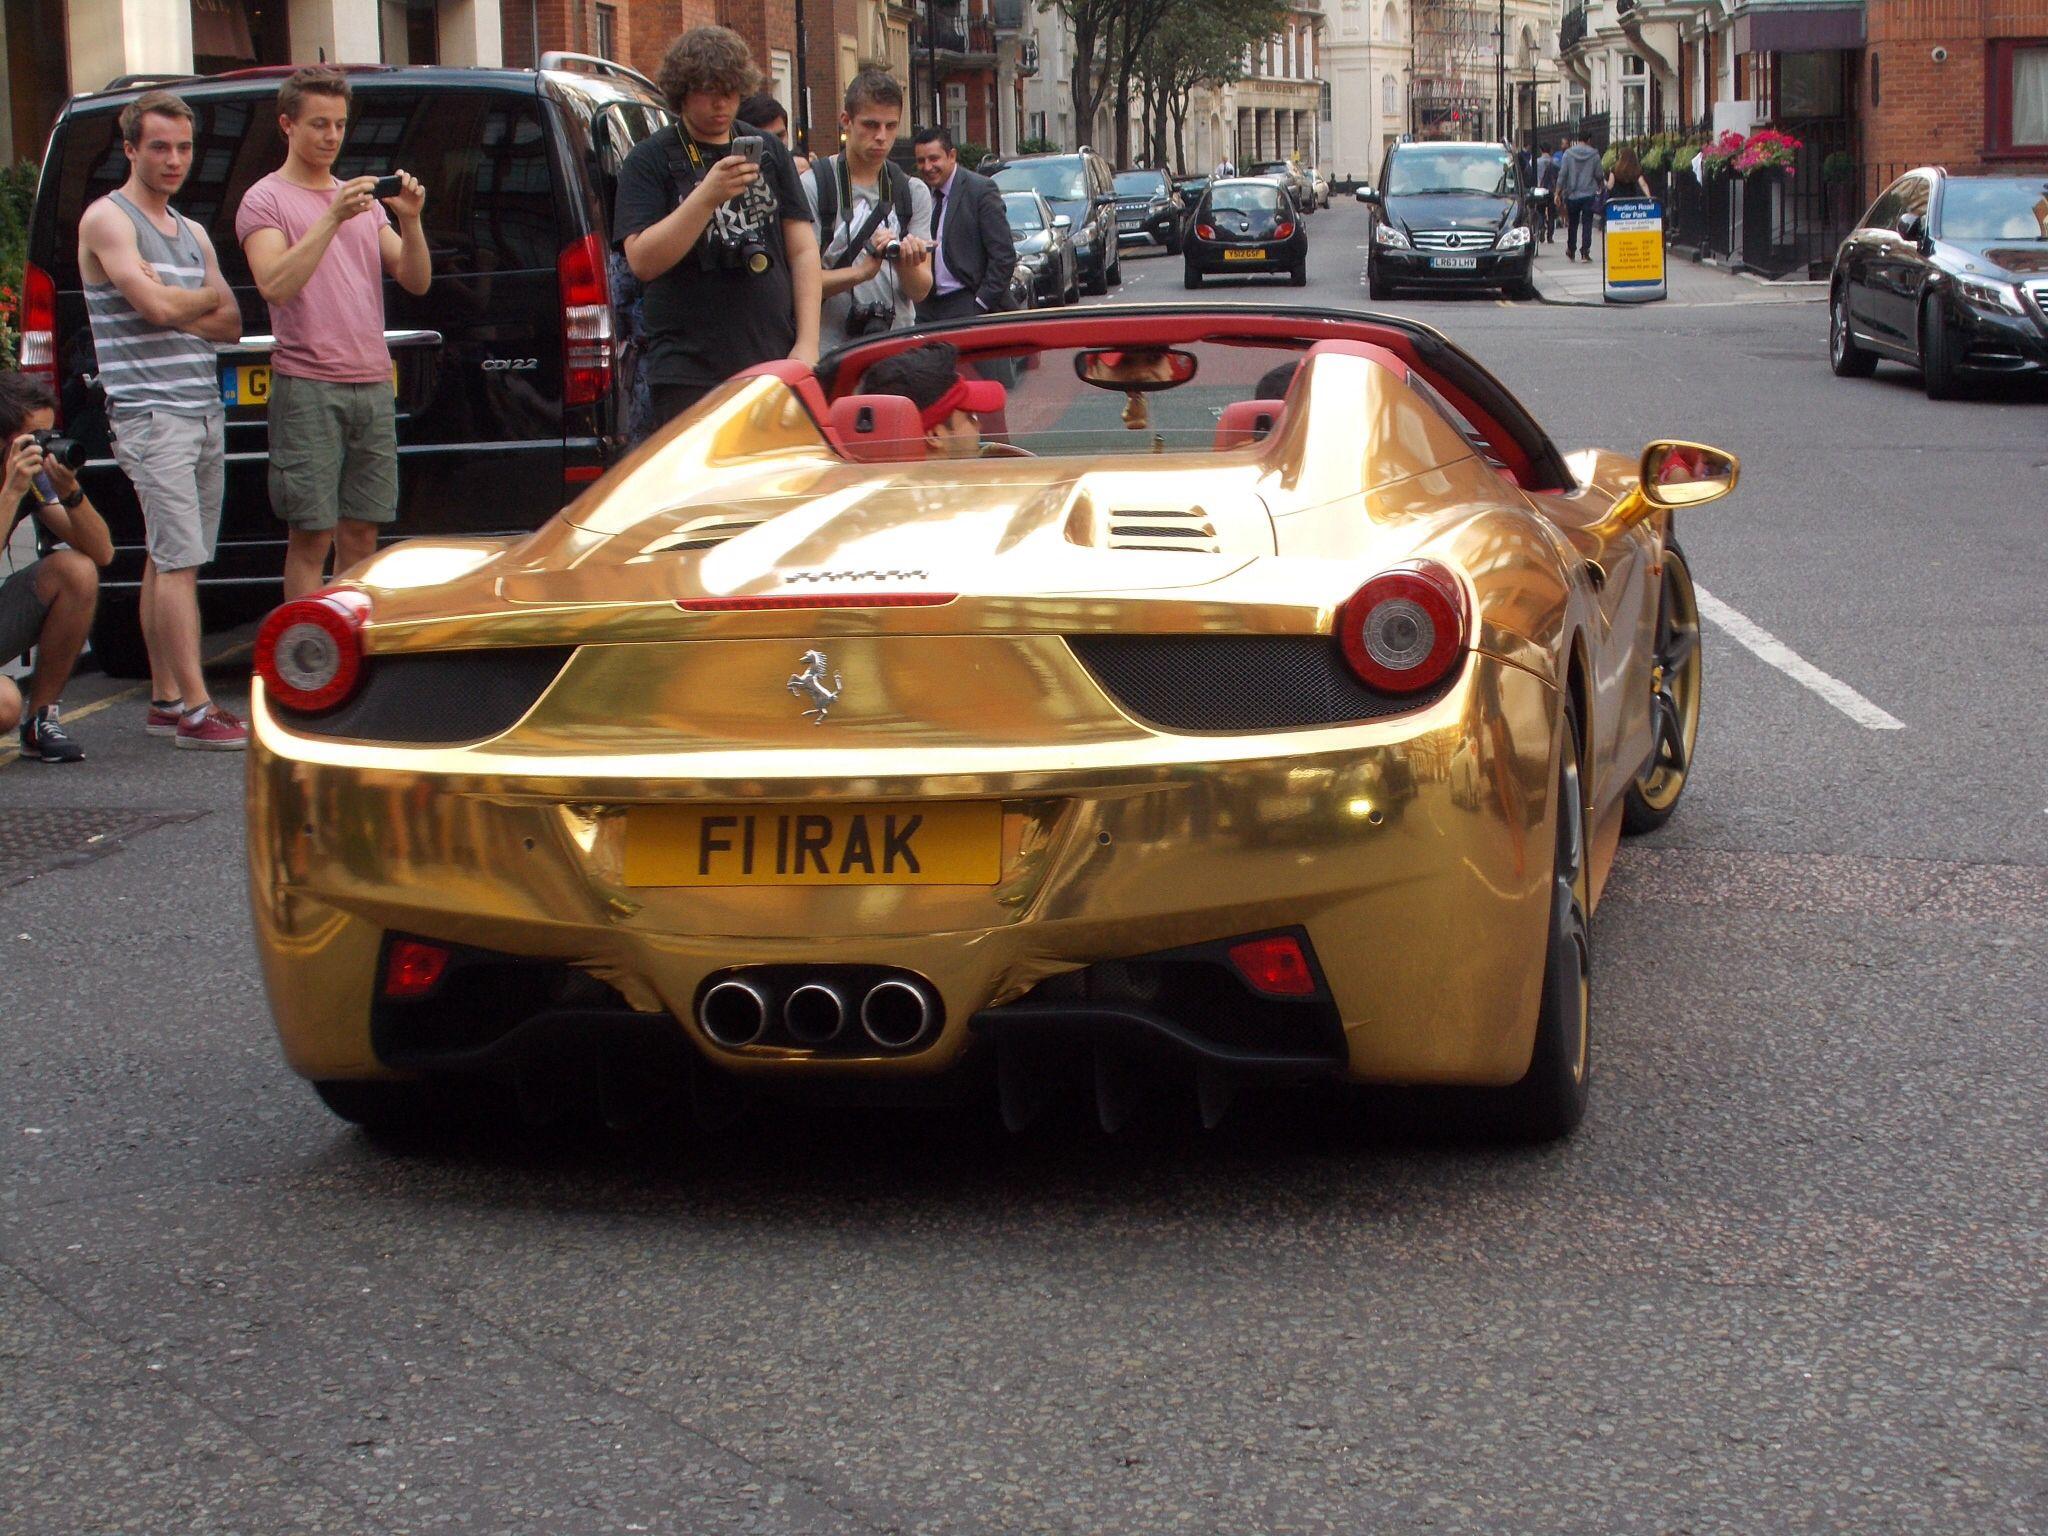 Gold Chrome Ferrari 458 Supercar In London Super Cars Private Number Plates Petrolhead